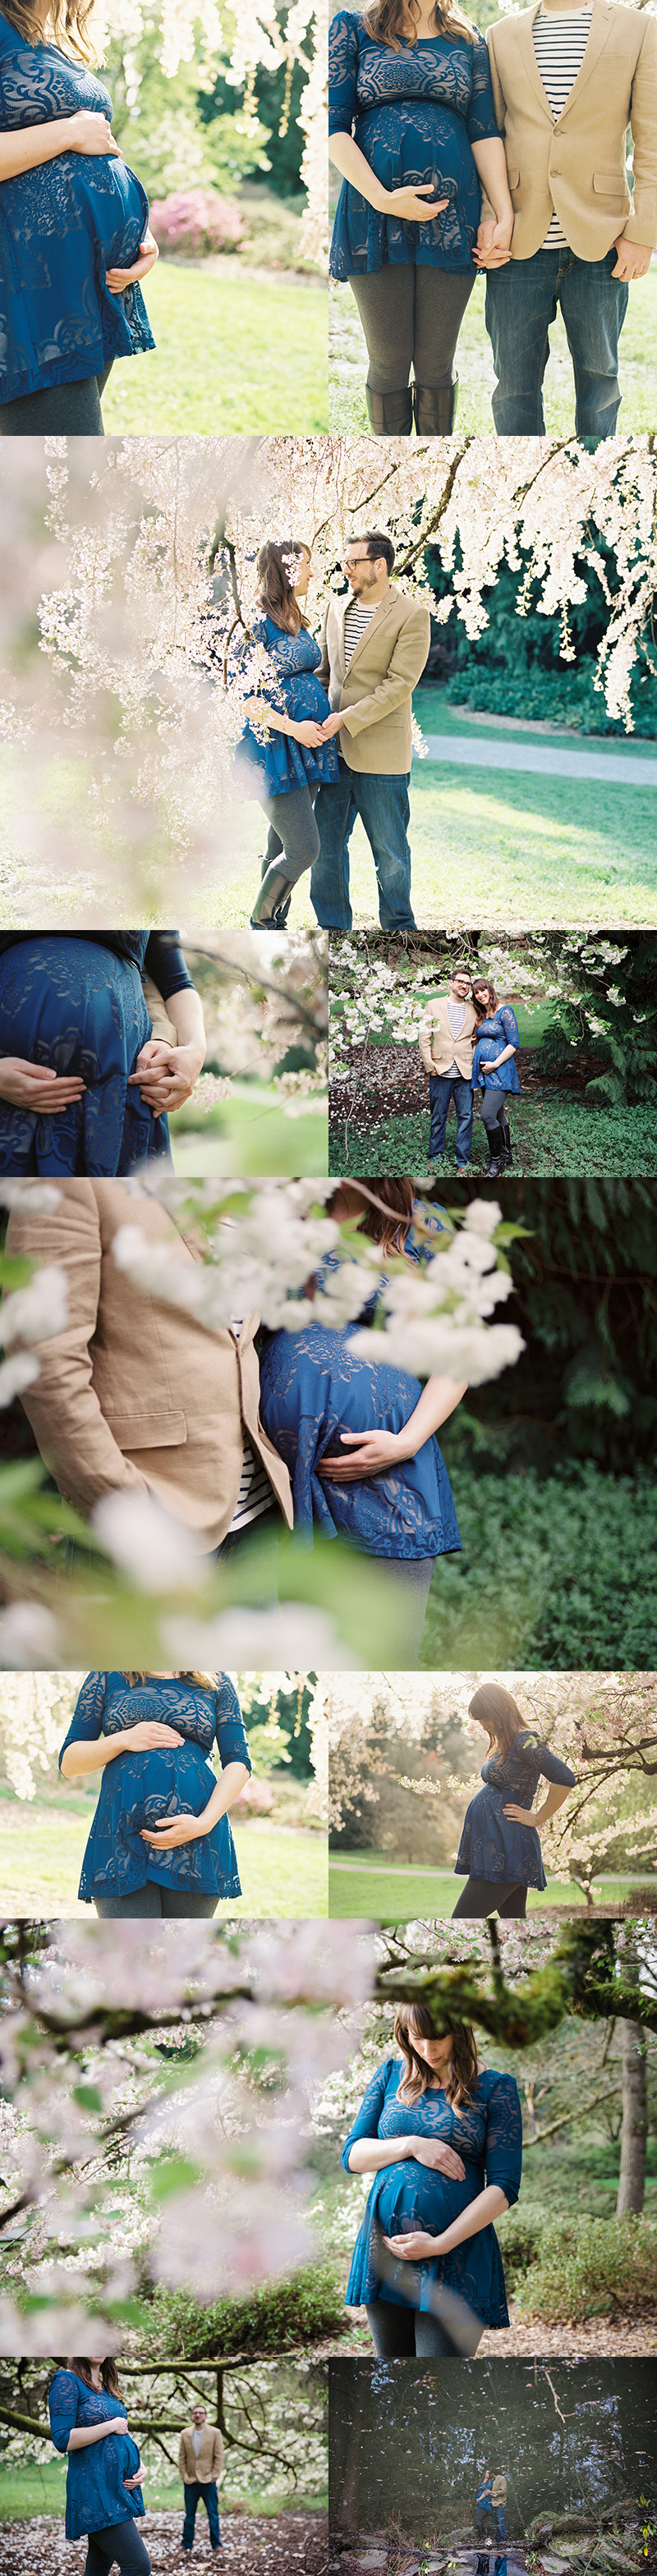 gphotoco_lindsay_maternity.jpg